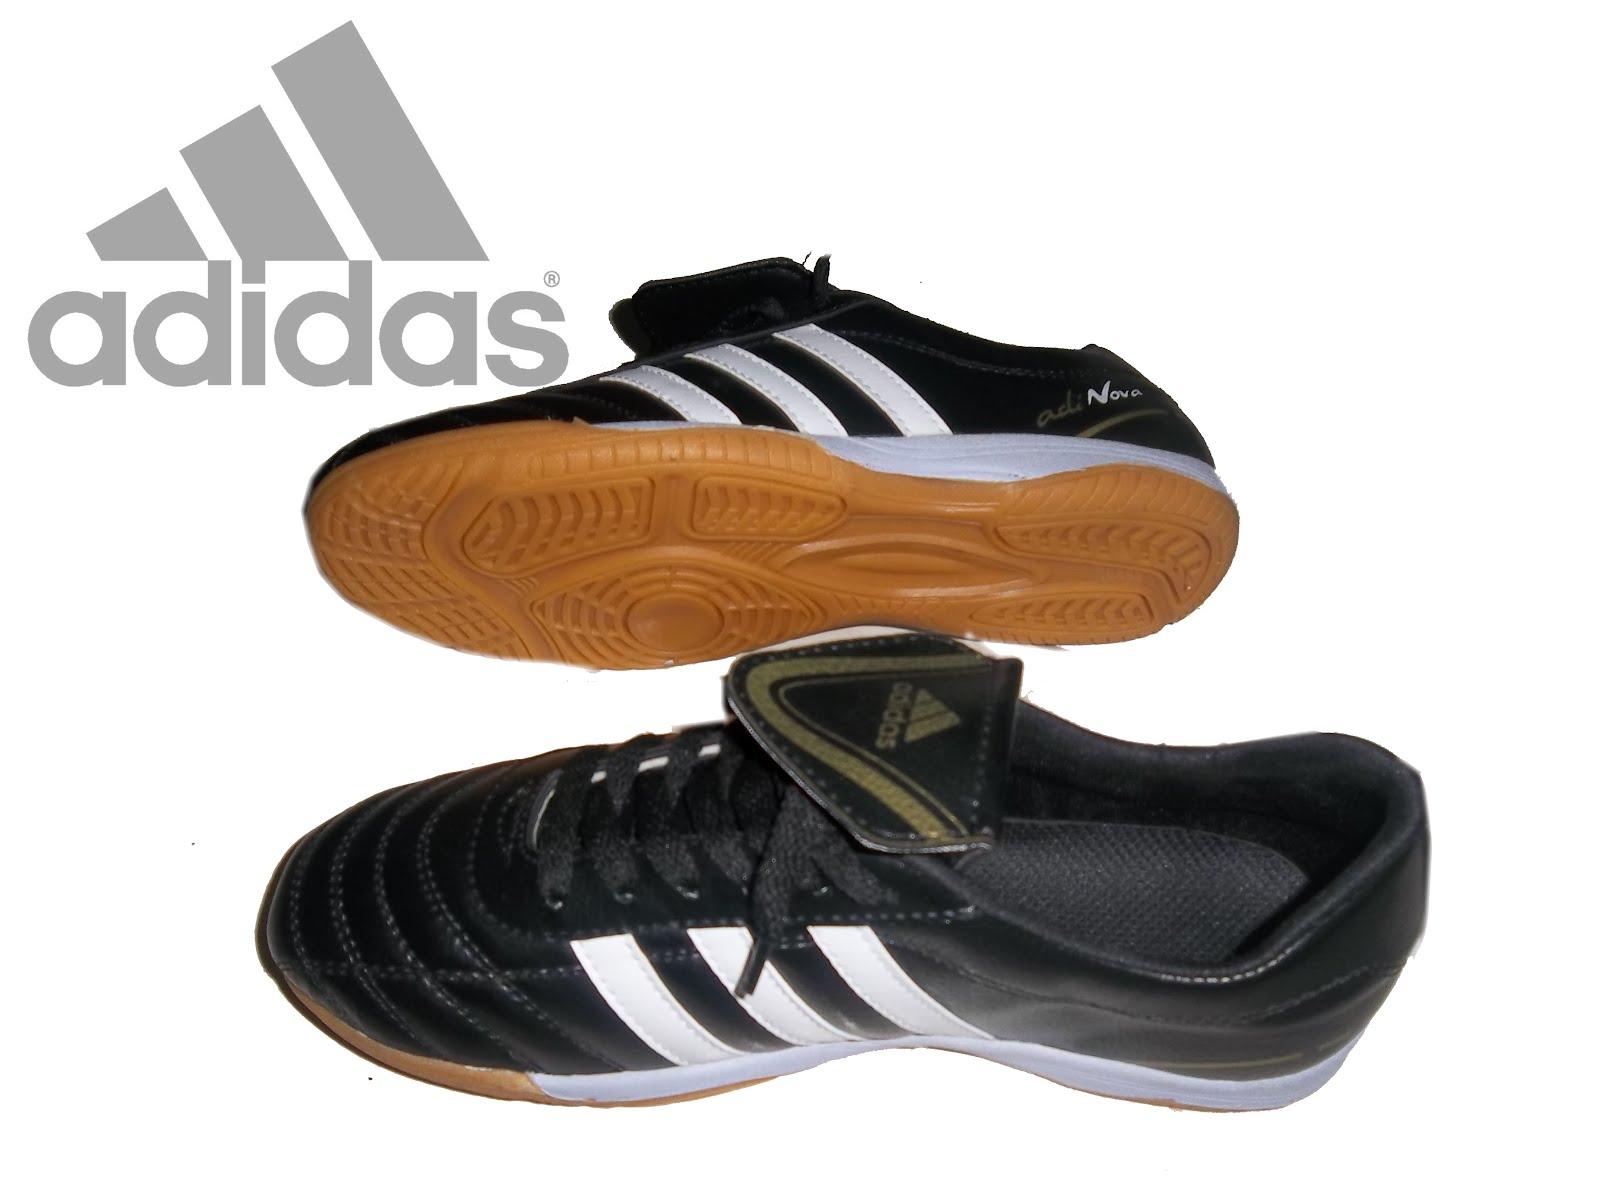 jual sepatu futsal online: toko sepatu futsal adidas original